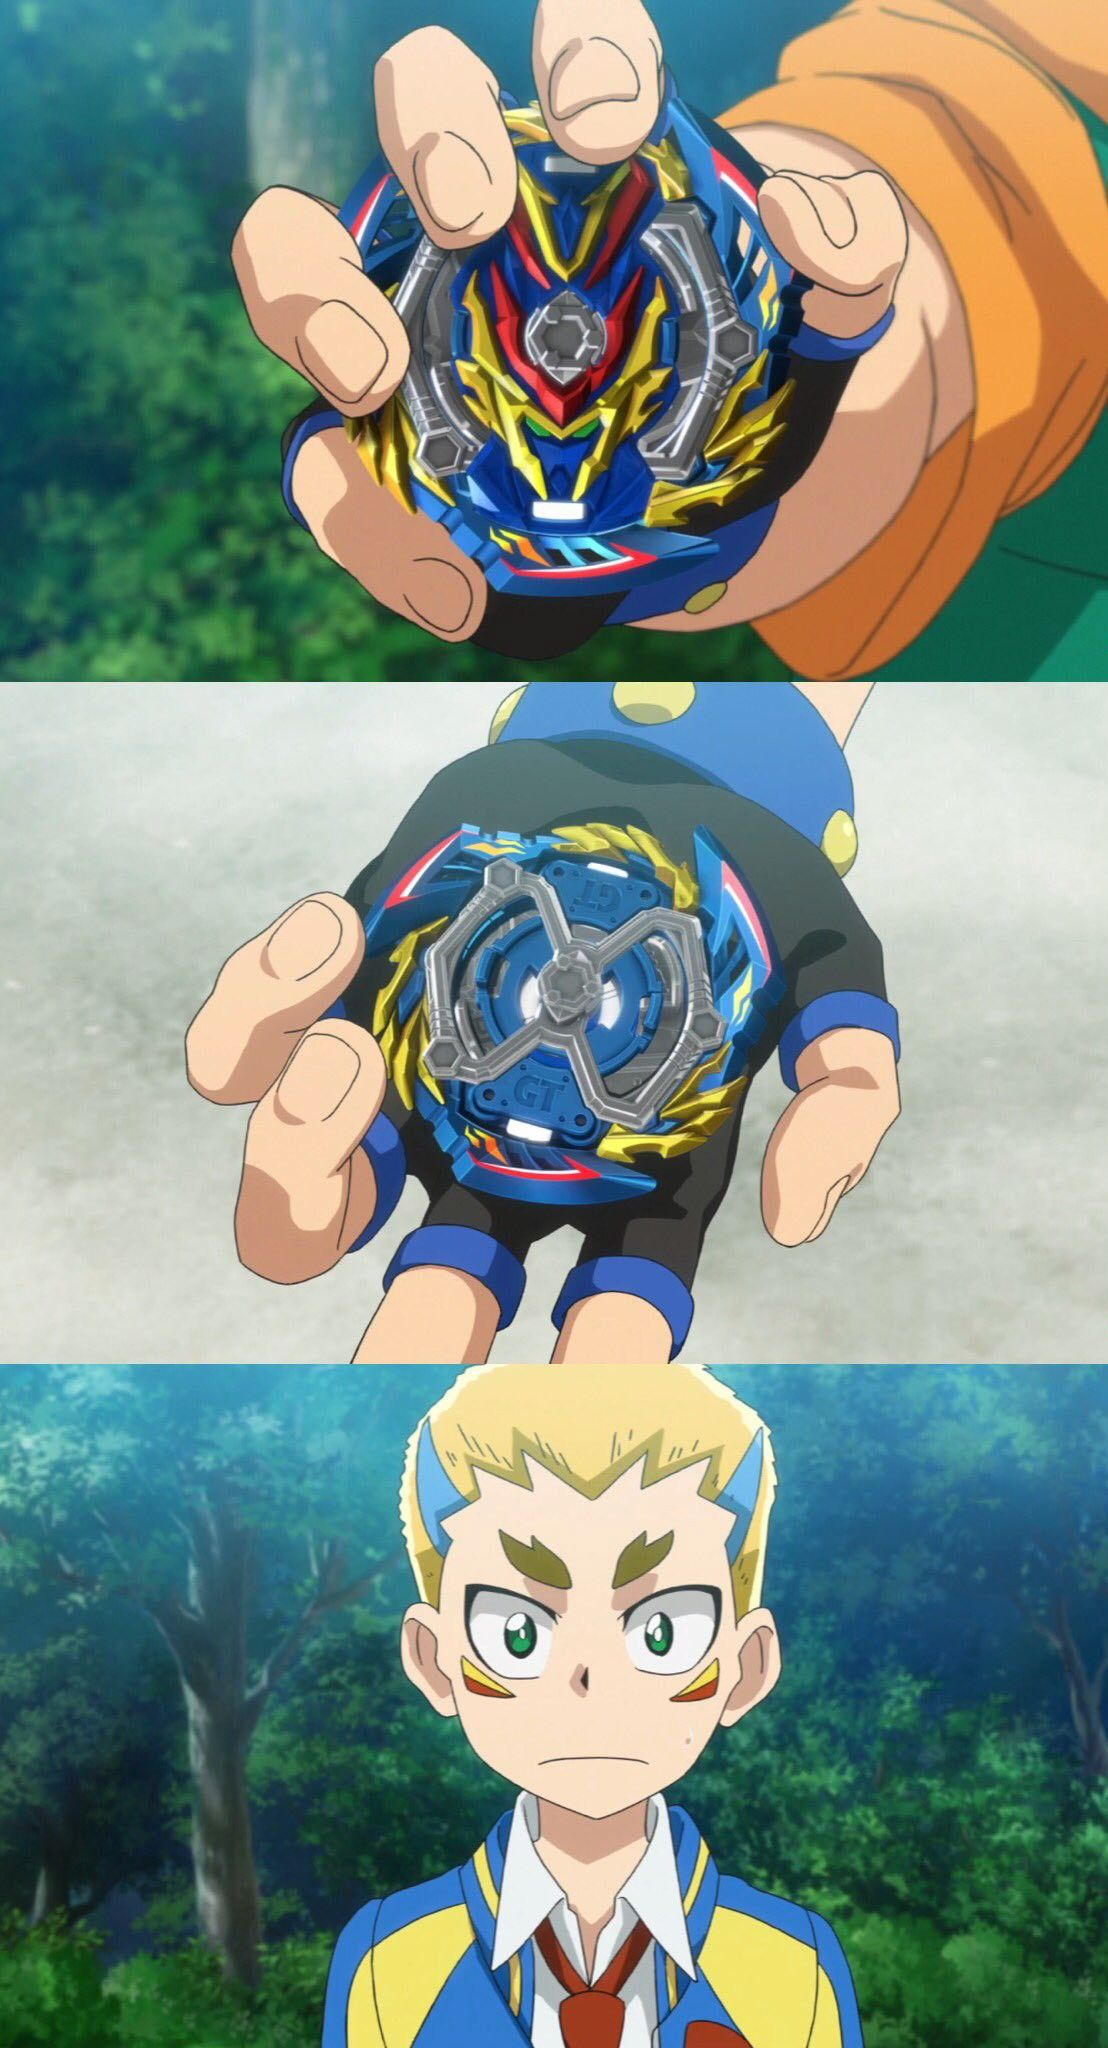 Pin by anime4ever on Bakuburst Edits Anime, Anime